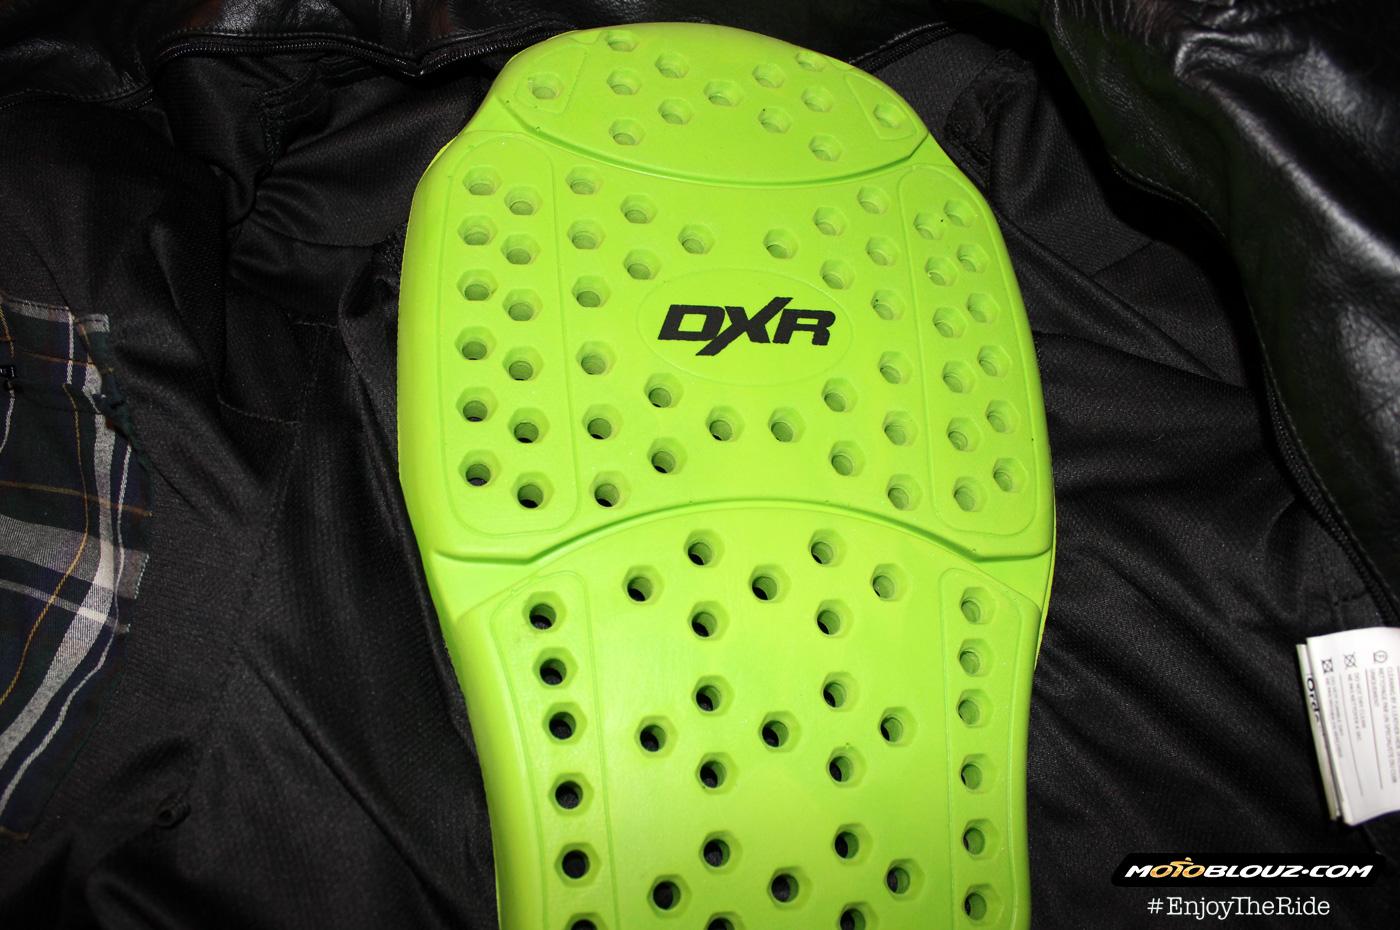 Dorsale DXR Back Protector